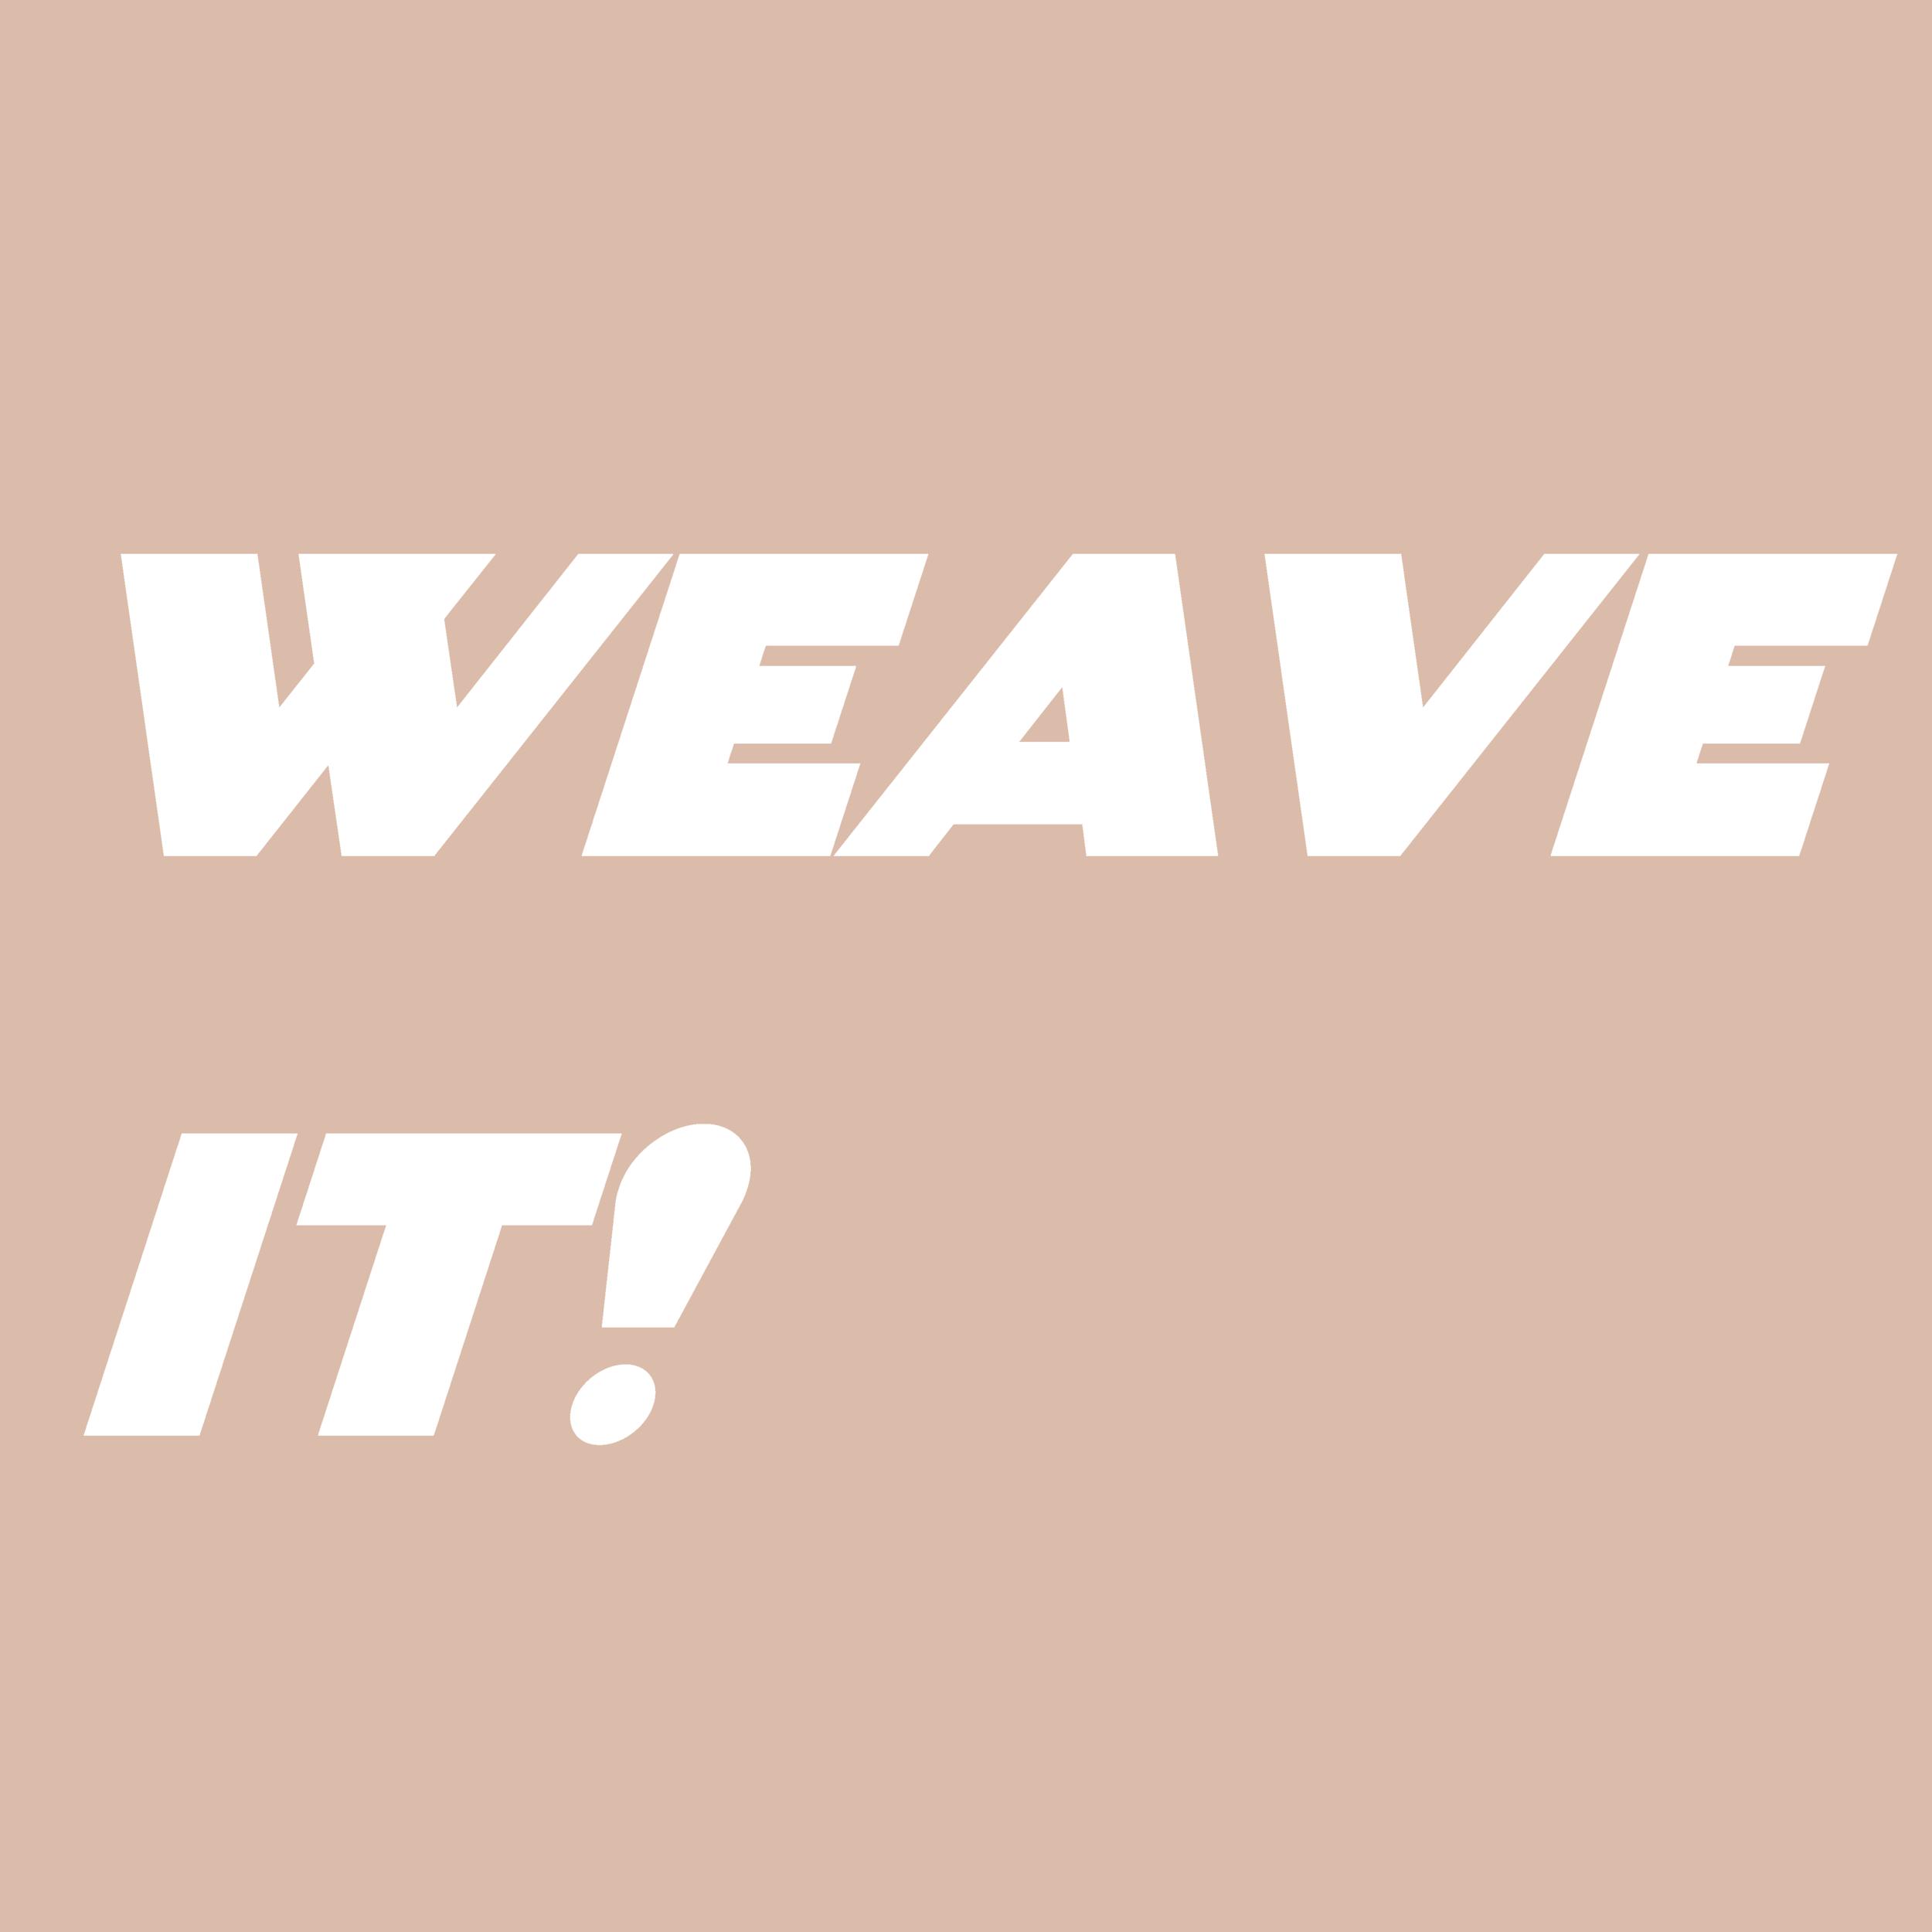 WeaveIt_Instagram.png